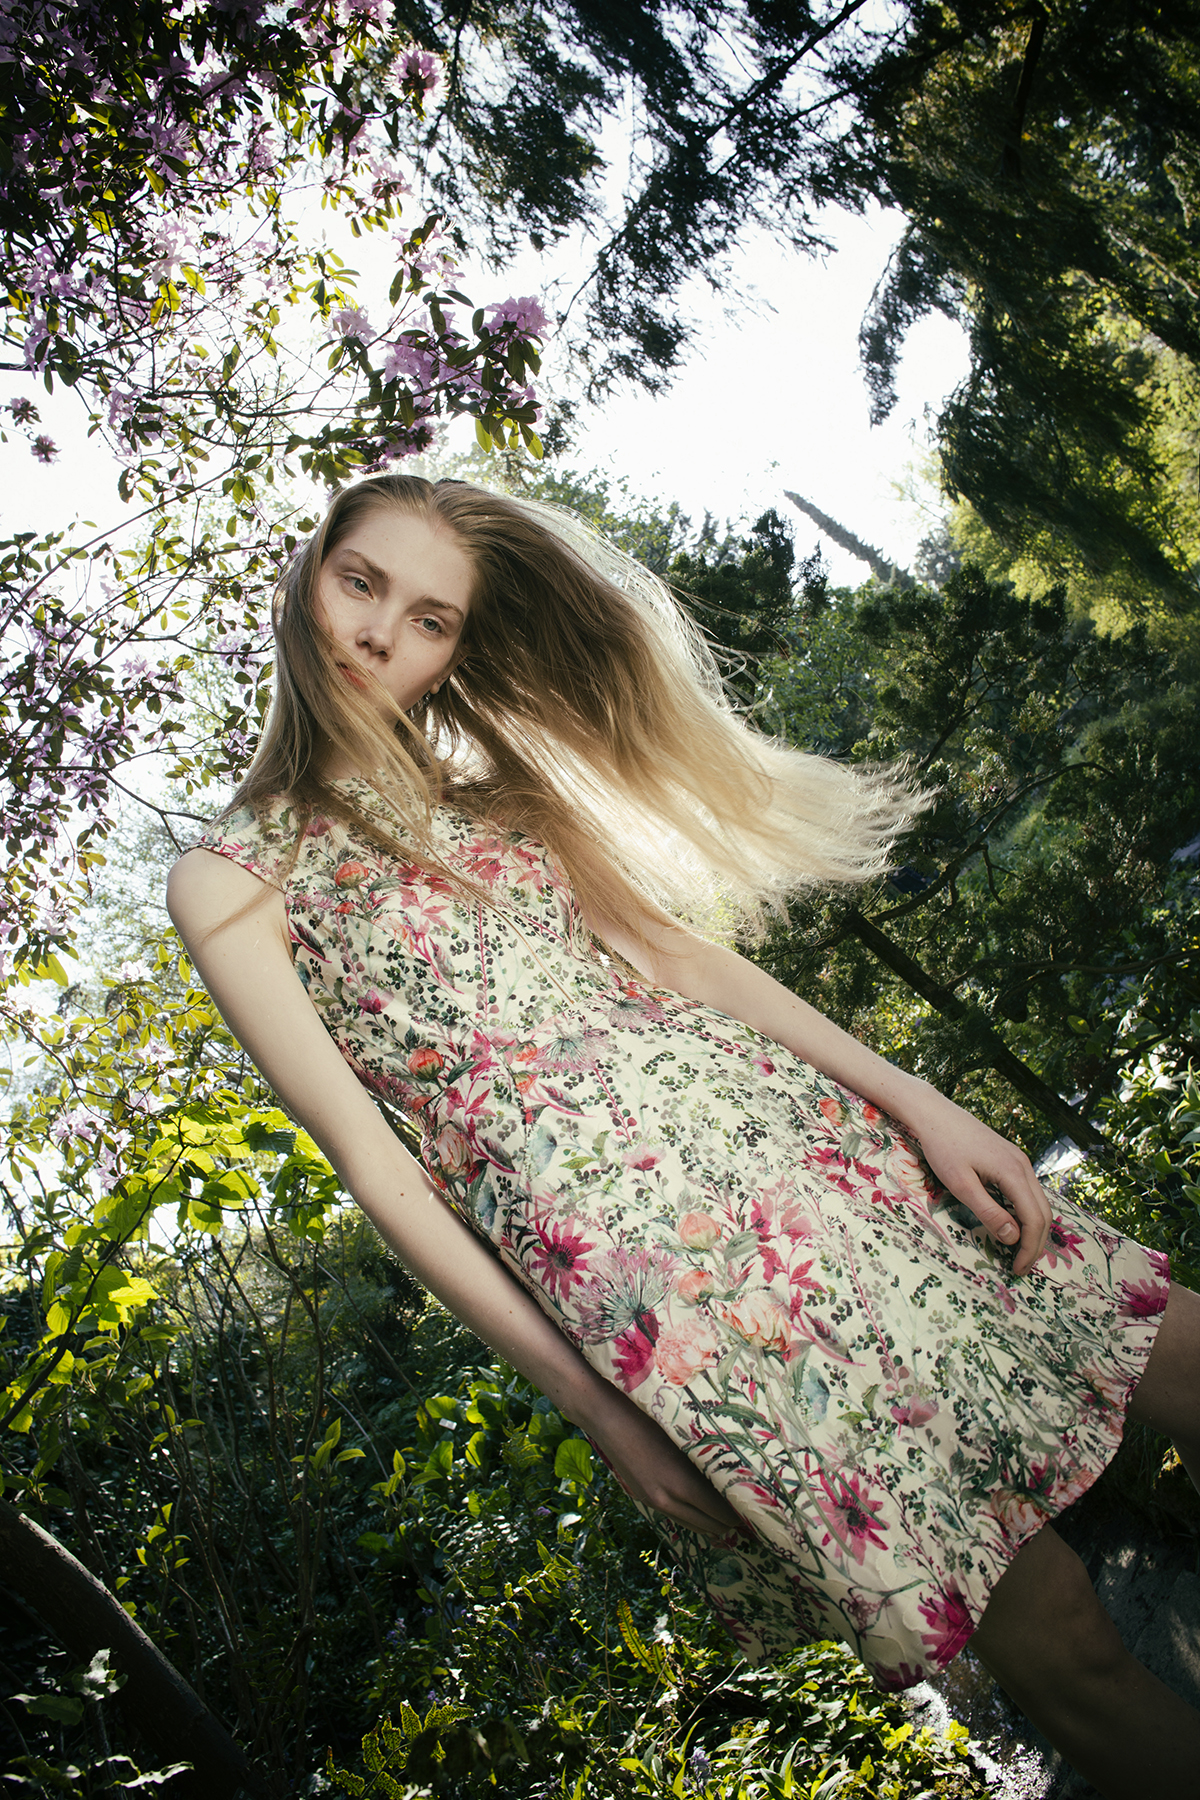 PascaleLPascaleLourmand_JusteMagazine_GardenParty_MV8A6522